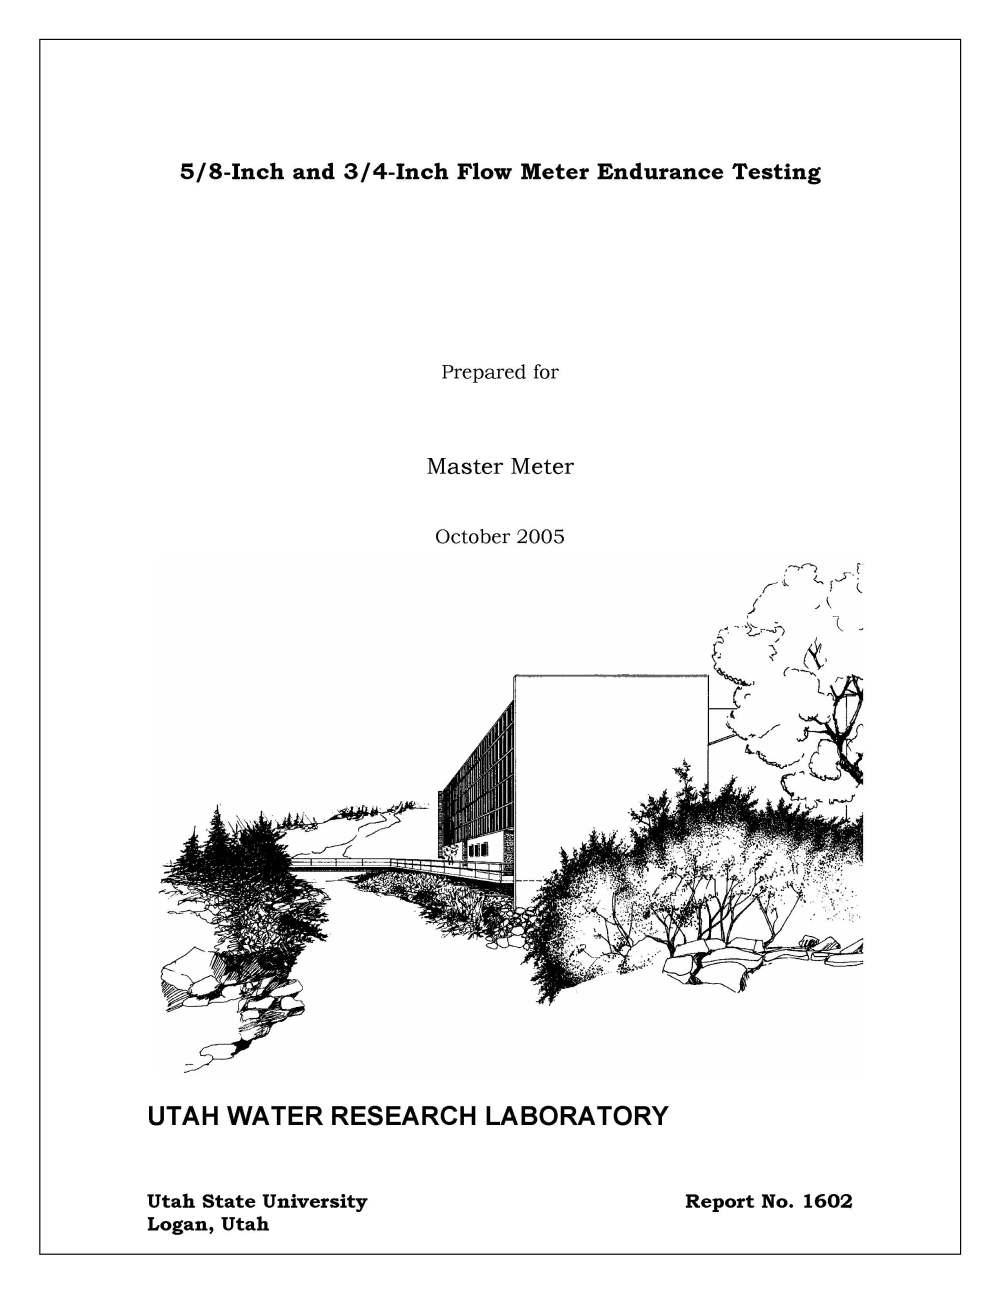 medium resolution of master meter blmj and pd meter endurance test report utah water research lab